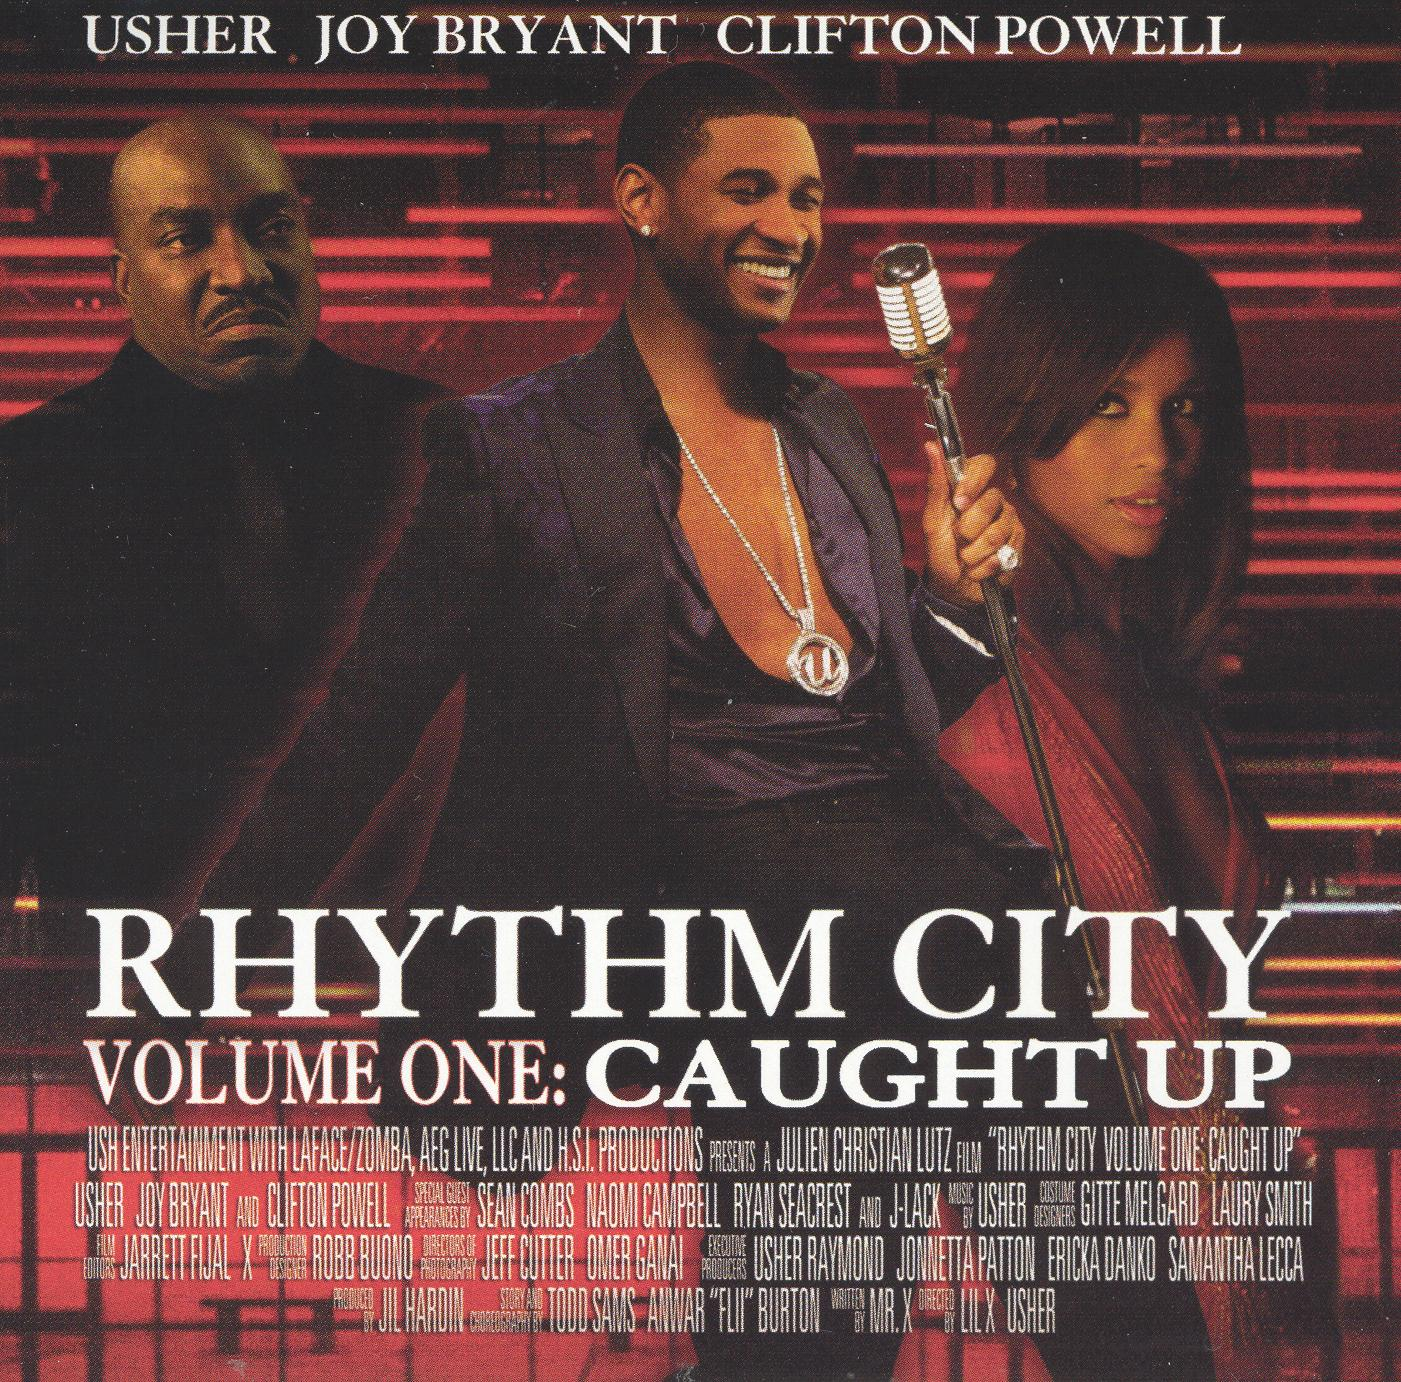 Usher: Rhythm City, Vol. 1 - Caught Up